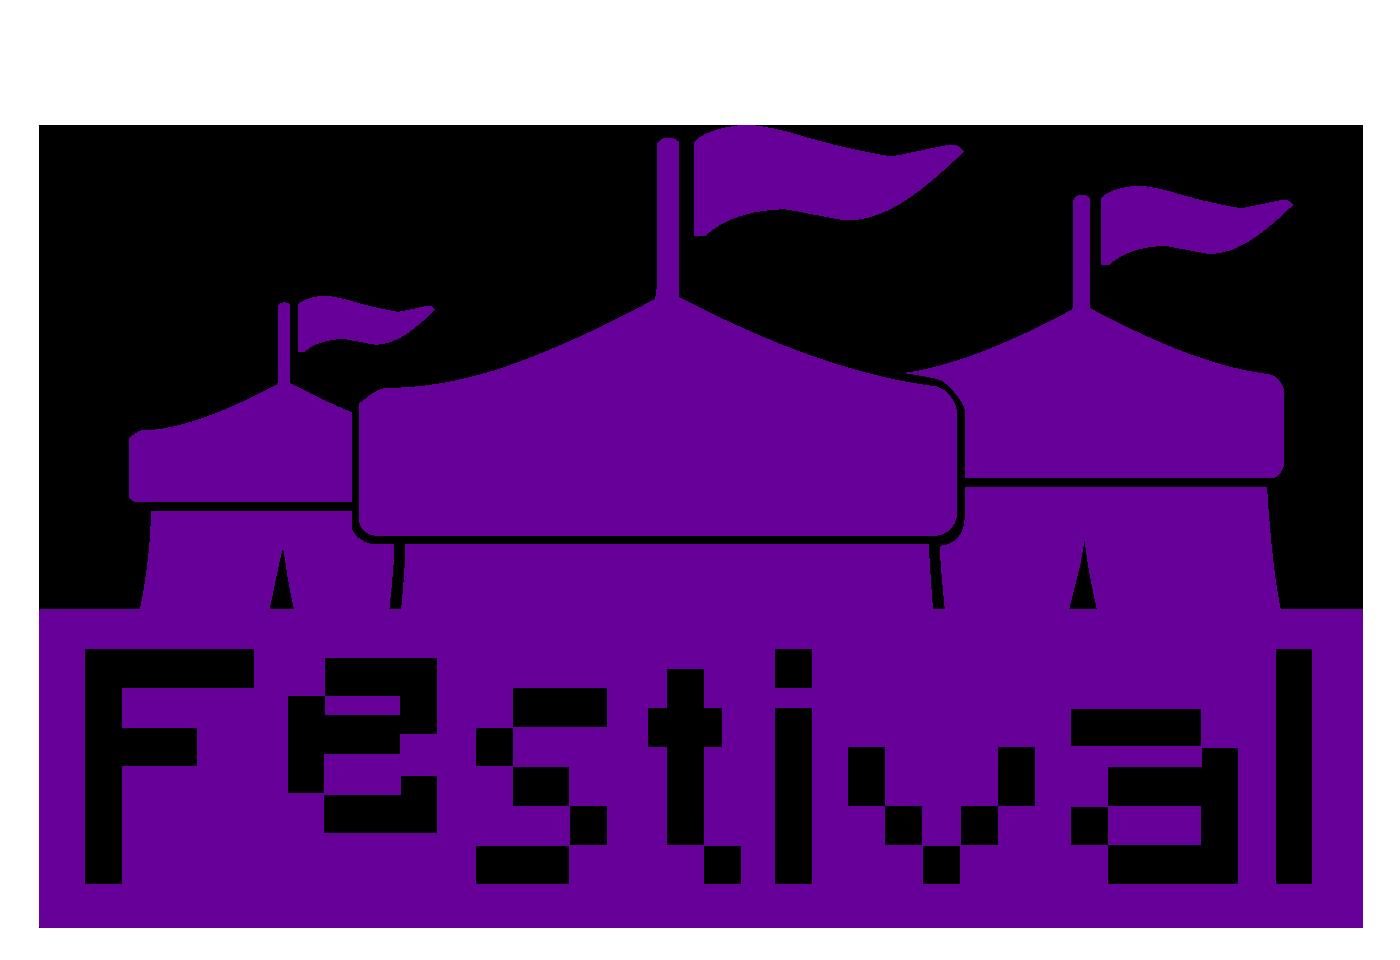 Festival plugin logo large